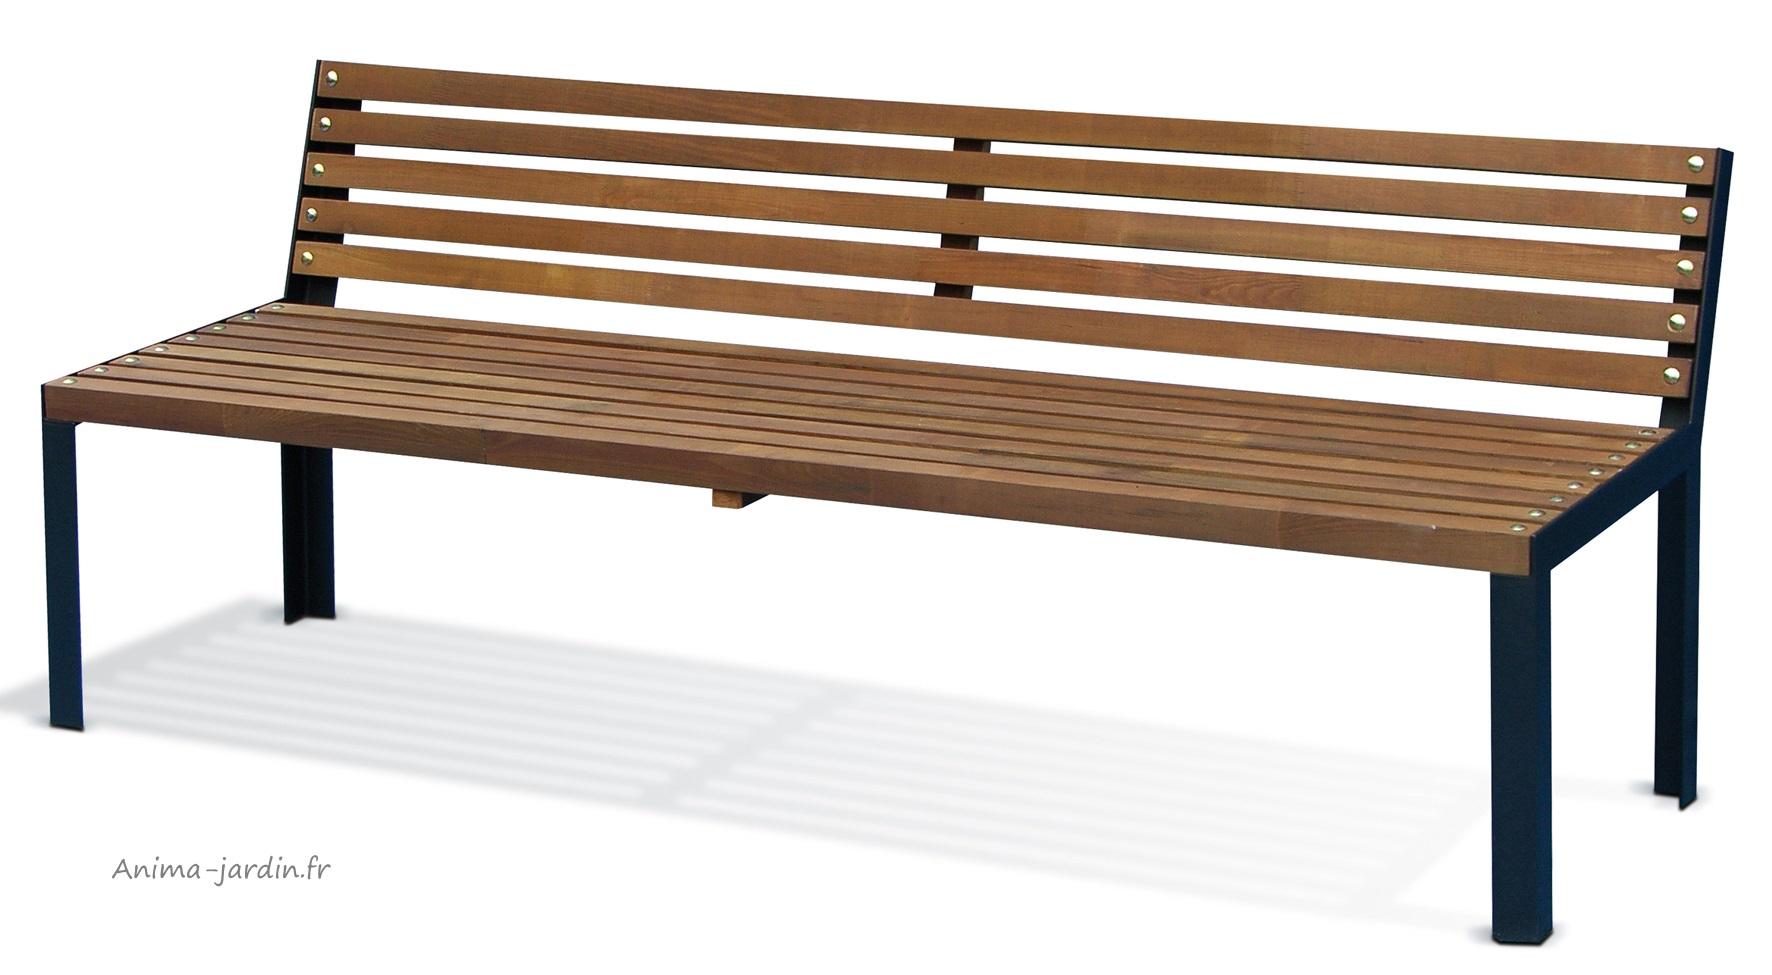 Banc-bois-autoclave-190cm-anima-jardin